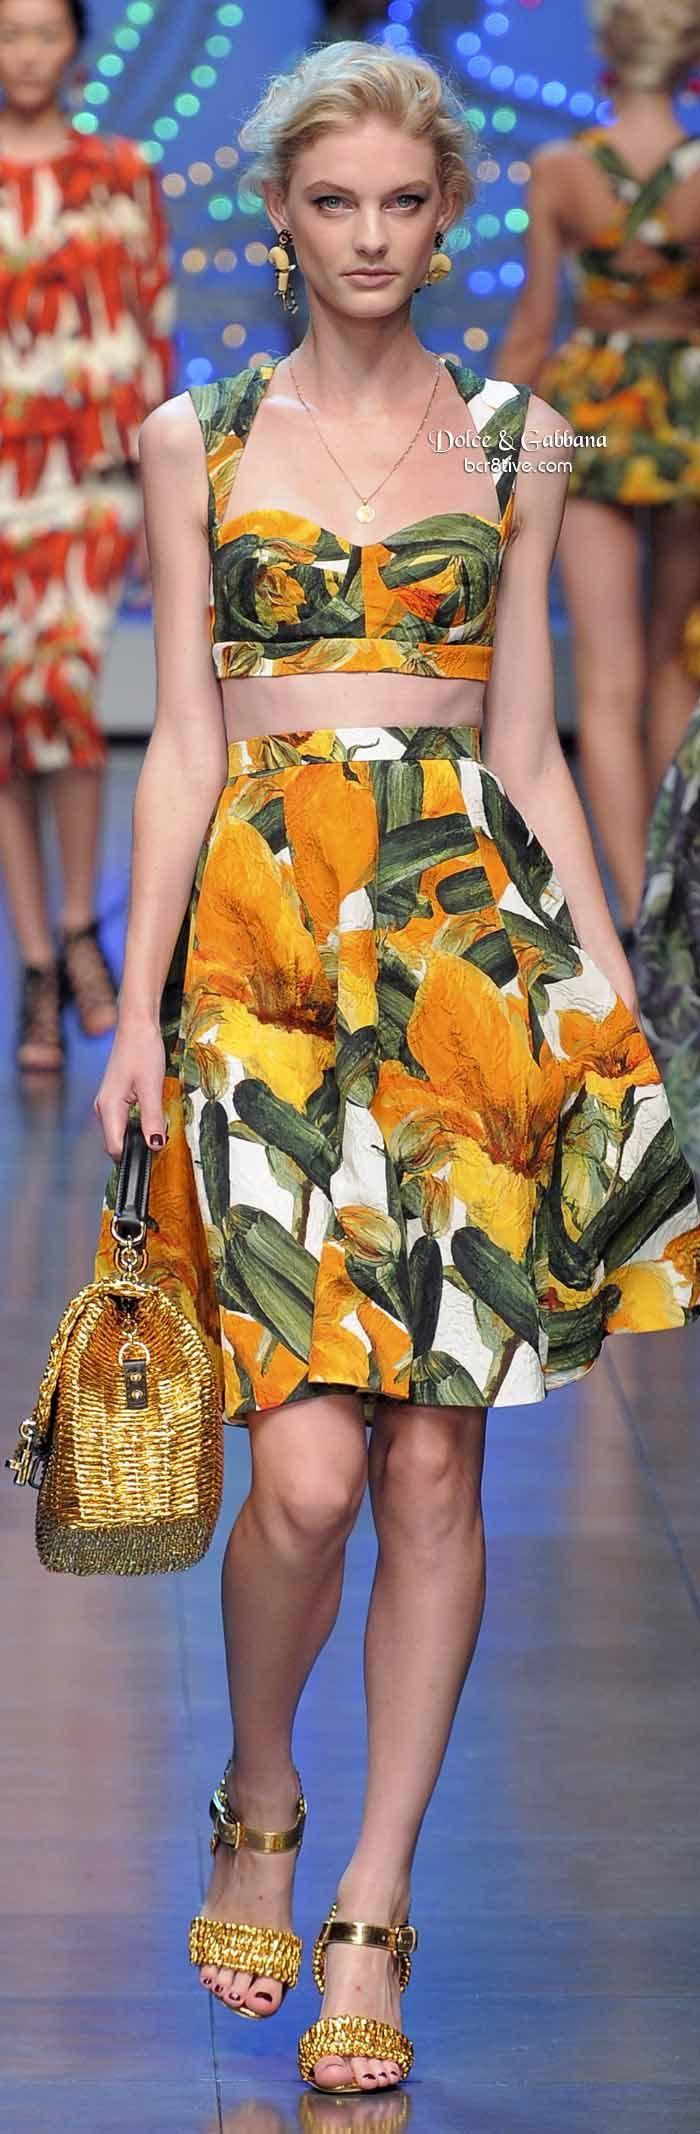 Dolce & Gabbana Brings the Bling 2014